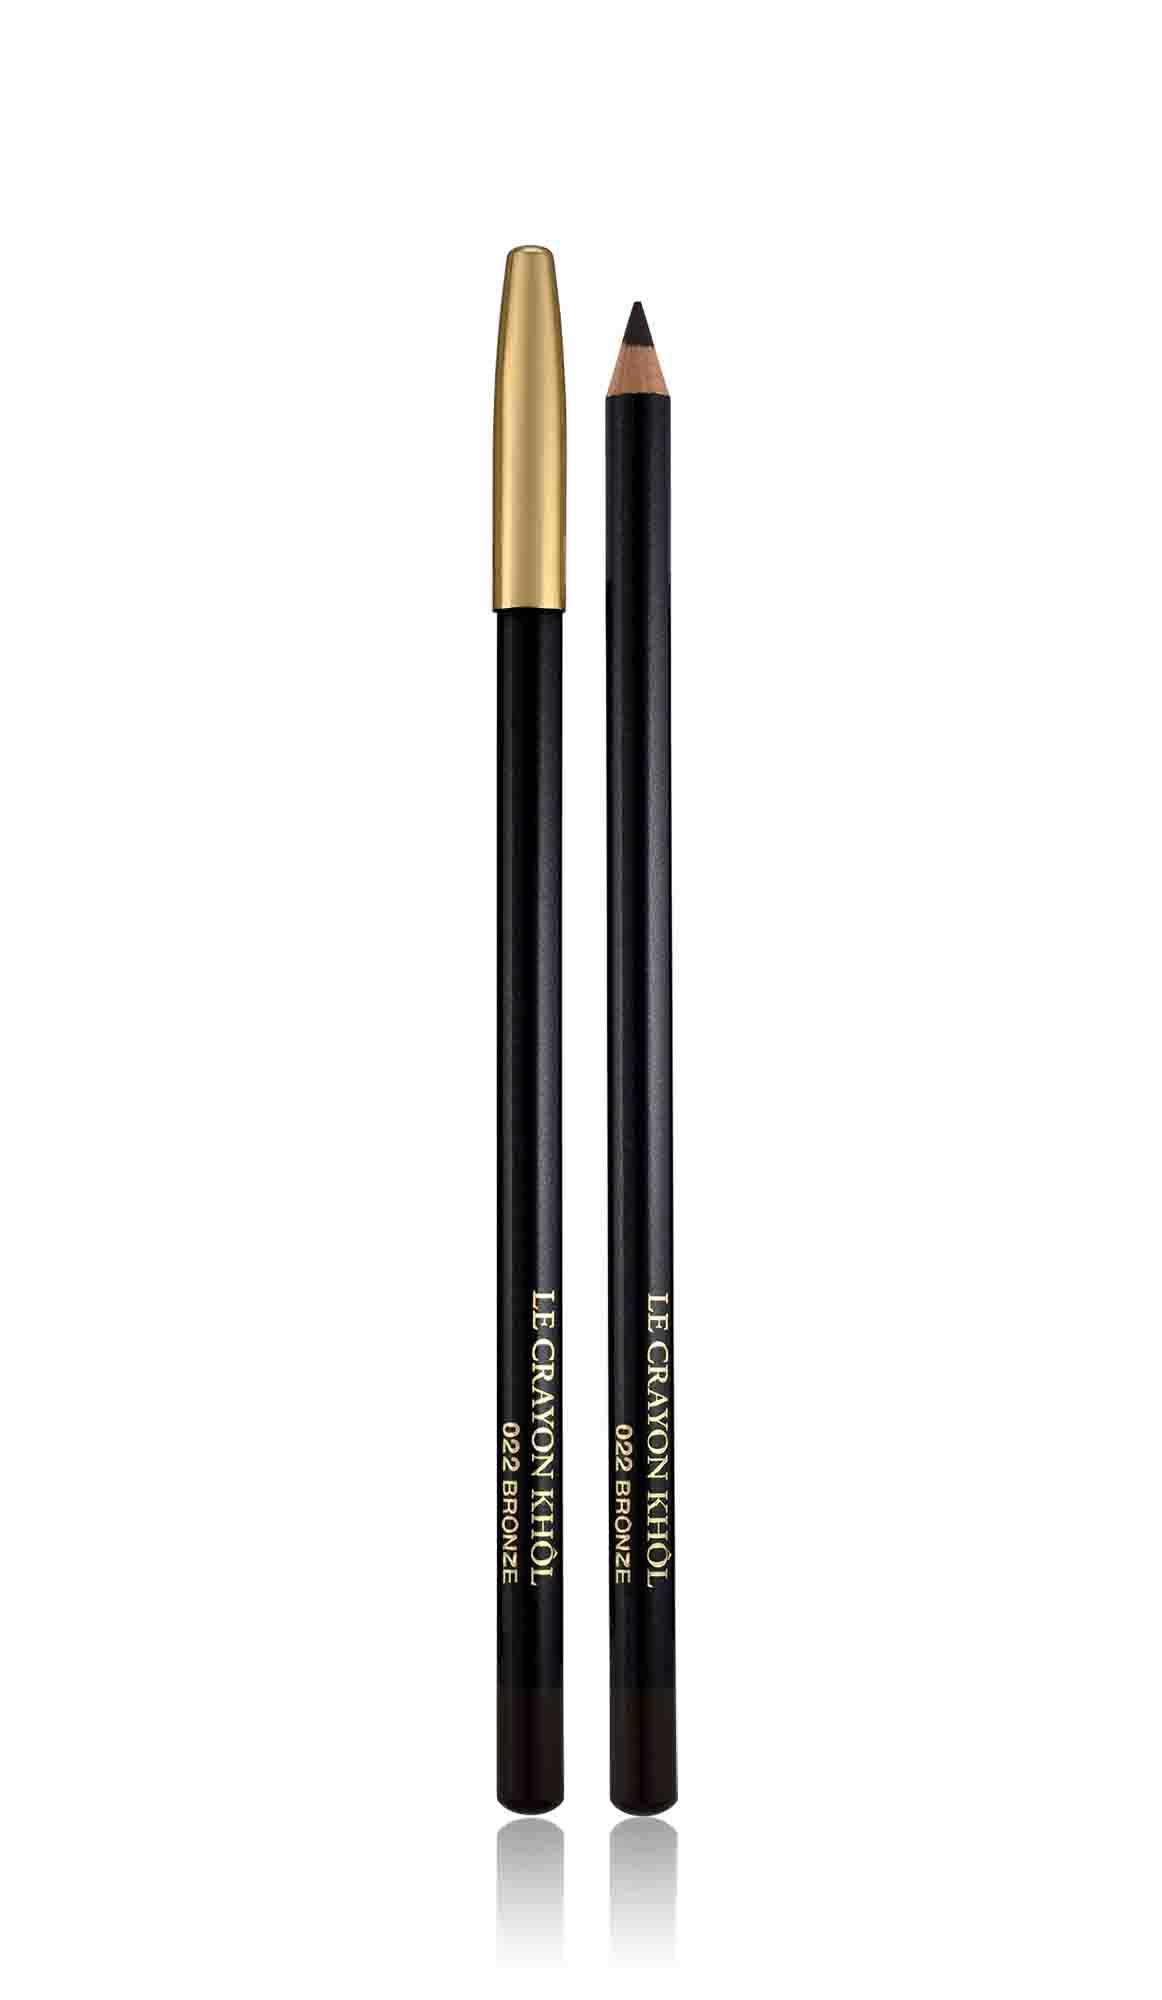 Lancôme Augen Crayon Khôl Kajalstift 1 g Bronze 710624